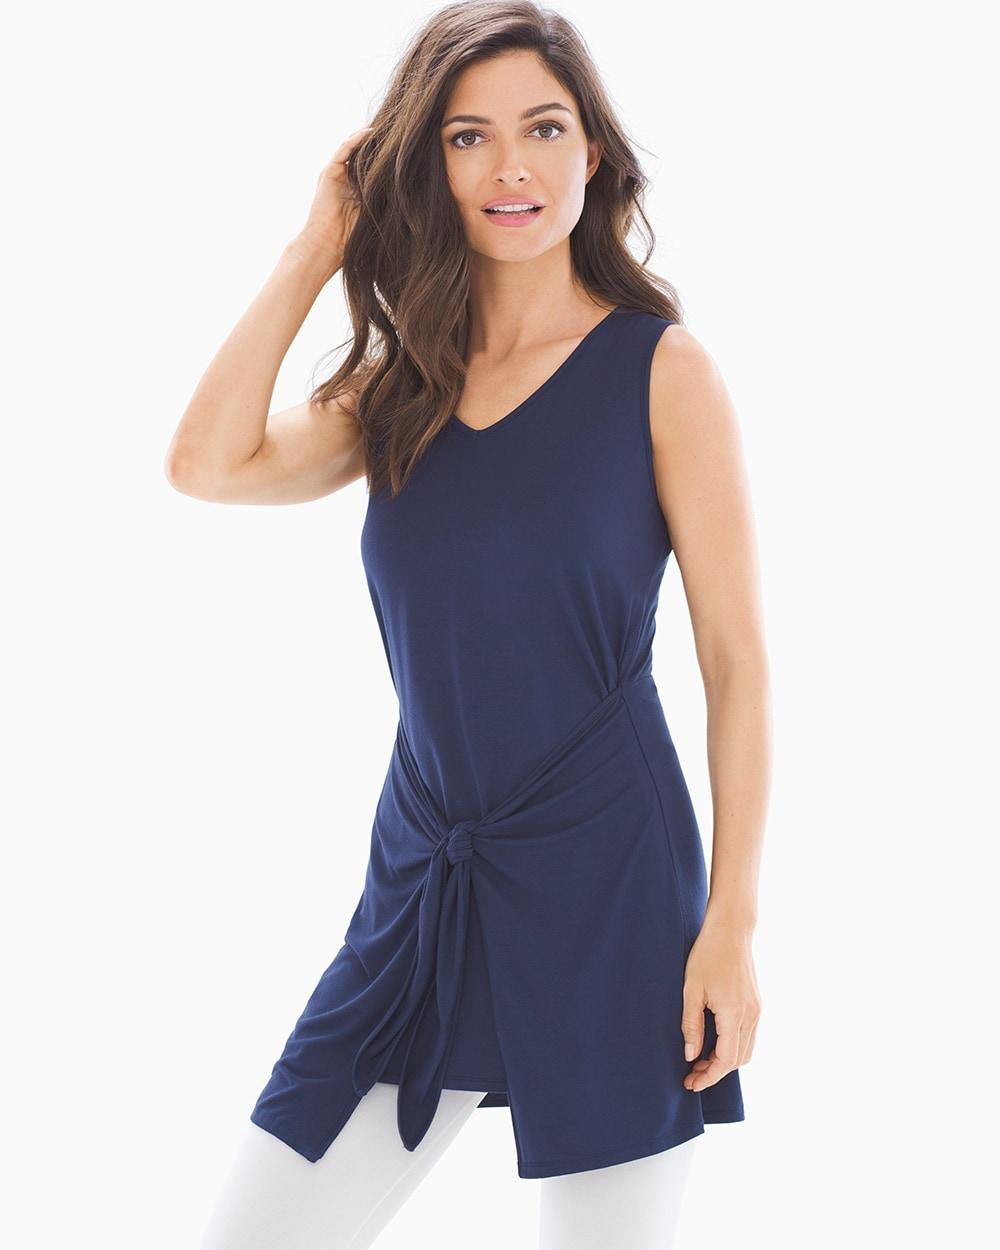 bc56018cfe88c Shop La Blanca Swimwear - Free Shipping - Soma